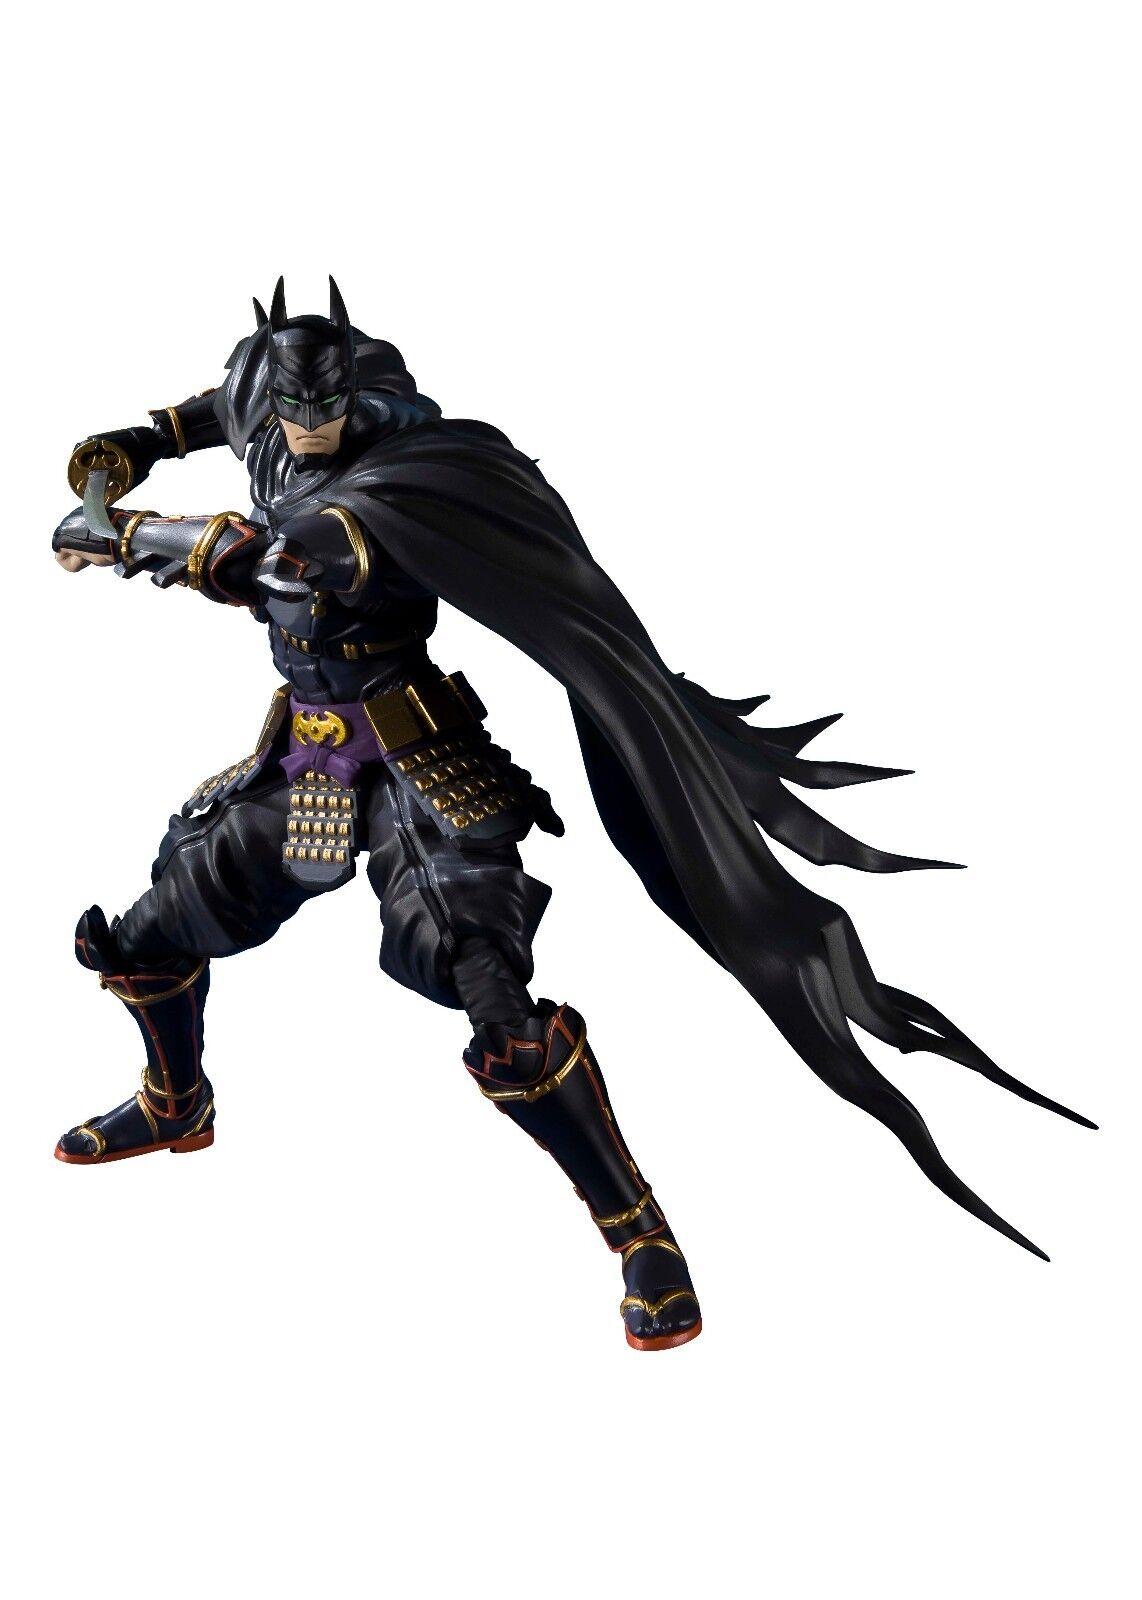 Batman Ninja - Batman S.H.Figuarts Action Figure (Bandai/Tamashii Nations)